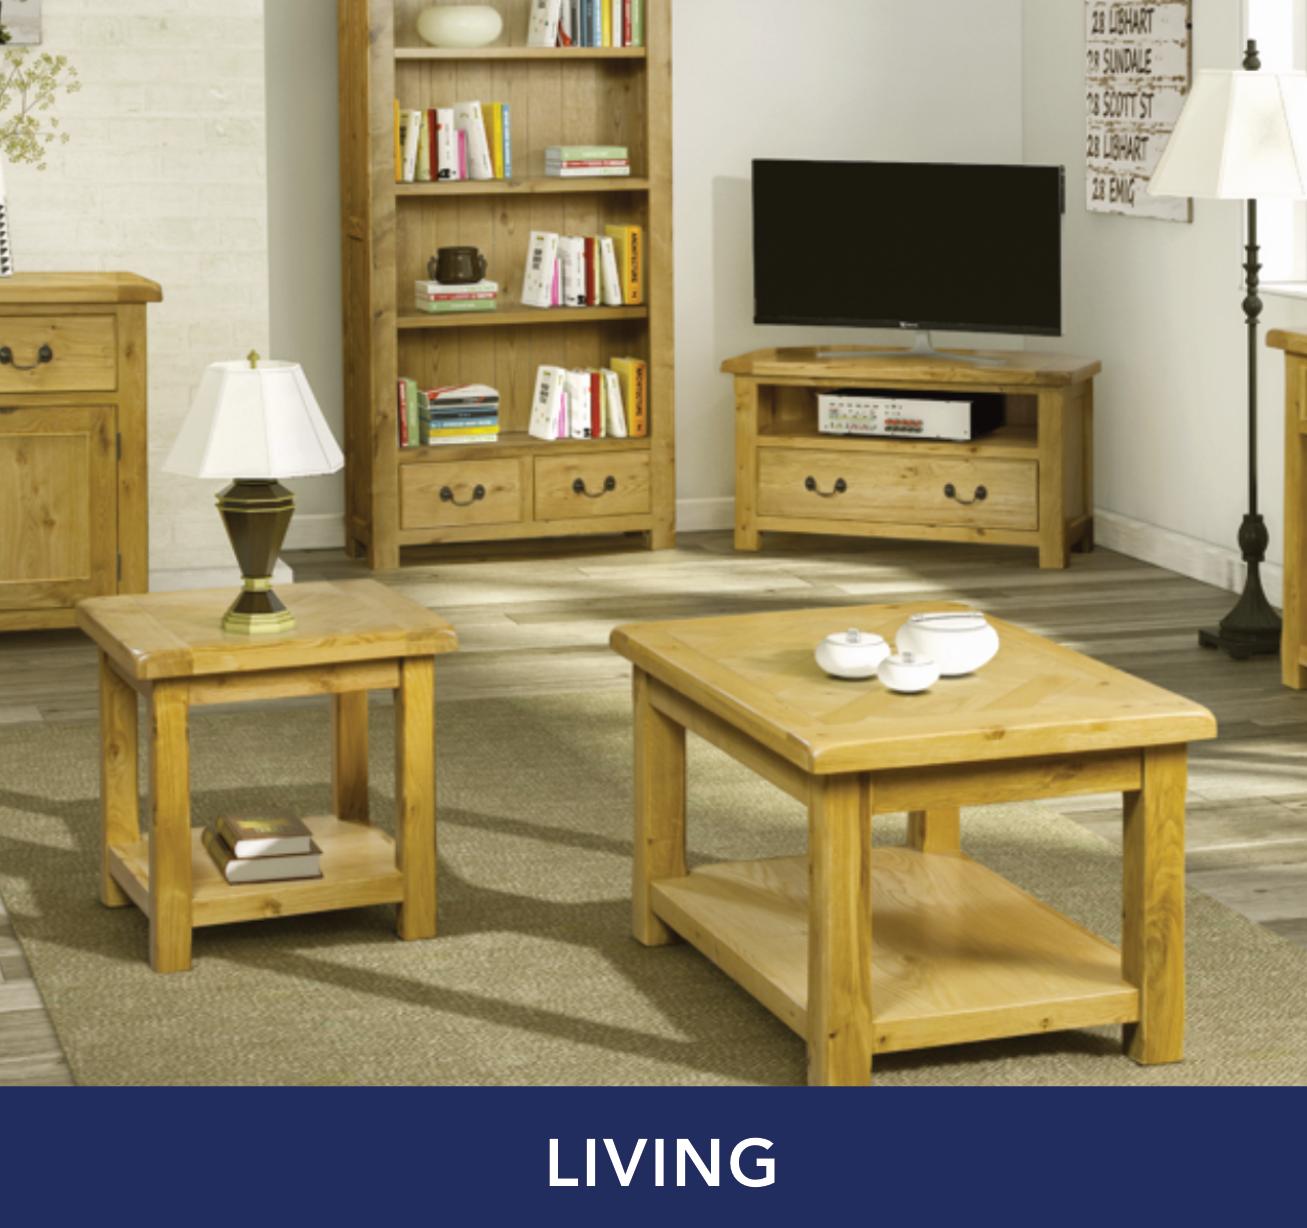 Living Room Furniture Group Page Link